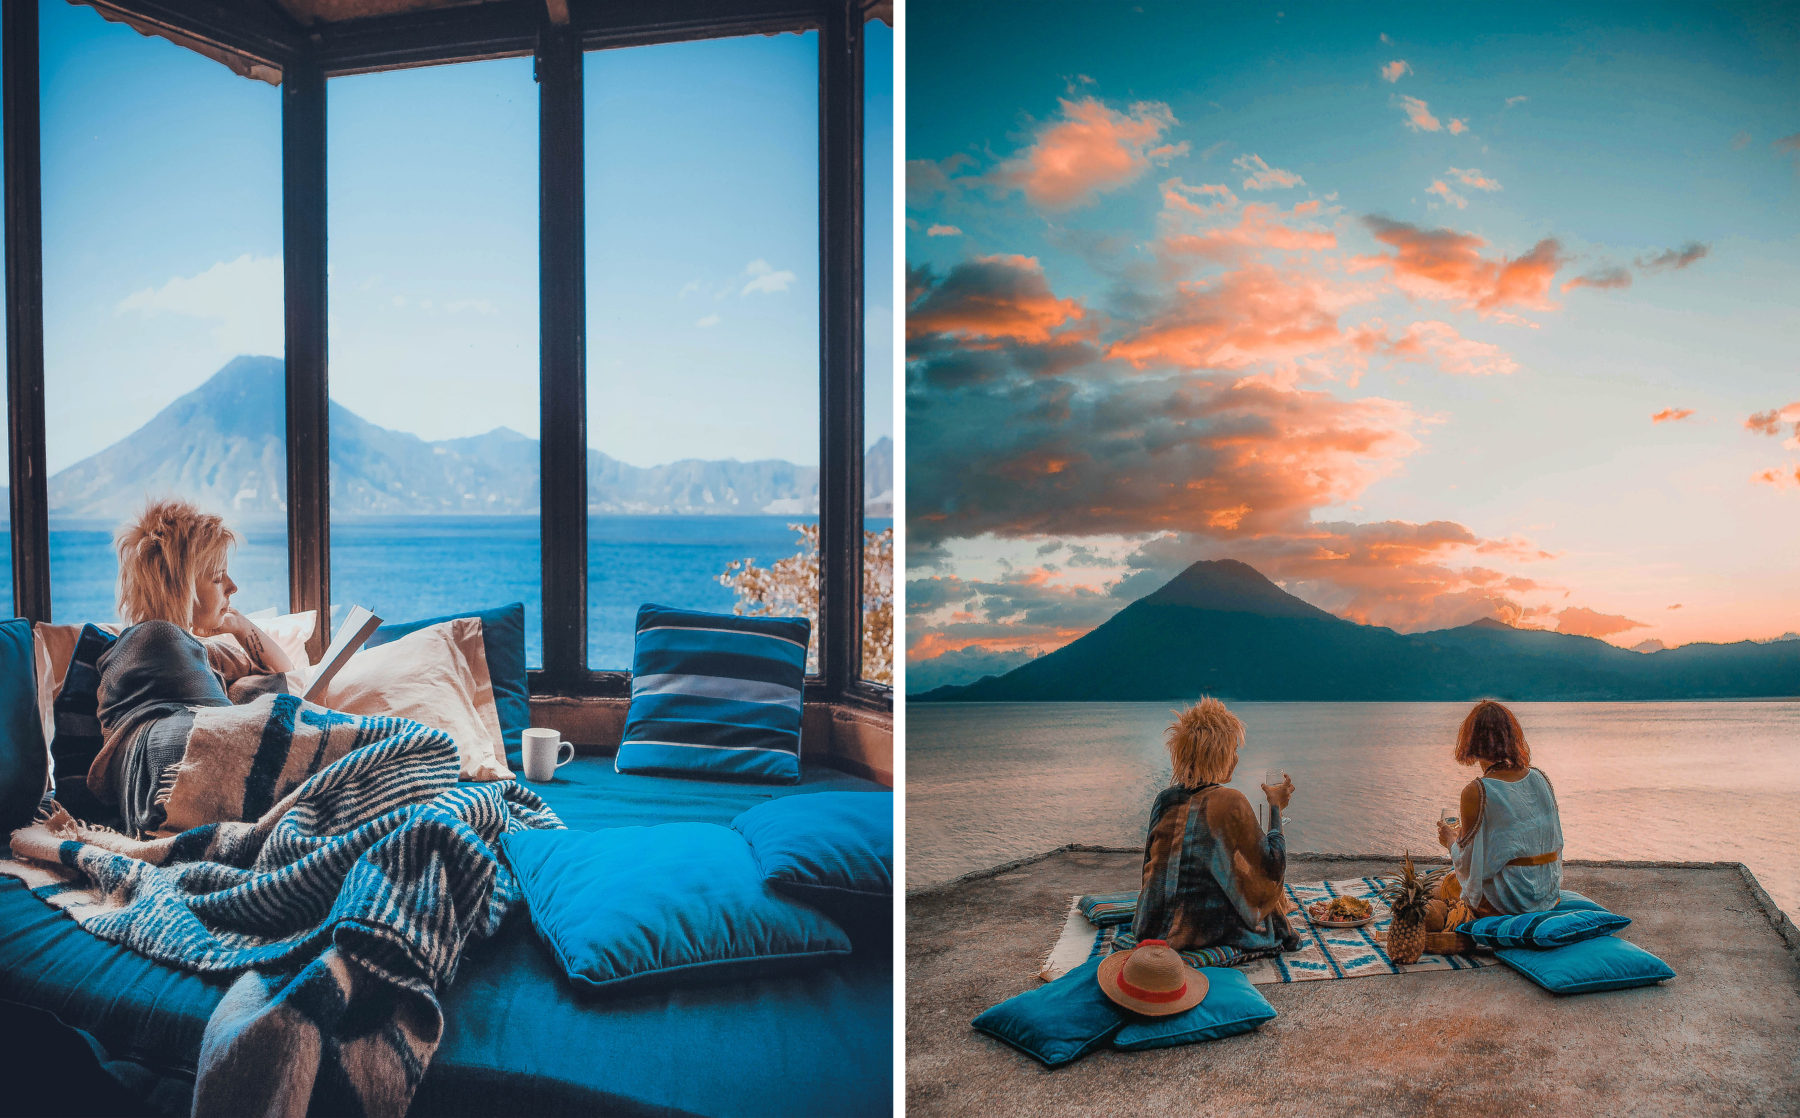 guatemala lake atitlan lago central america most beautiful lake in the world blue water sunny day